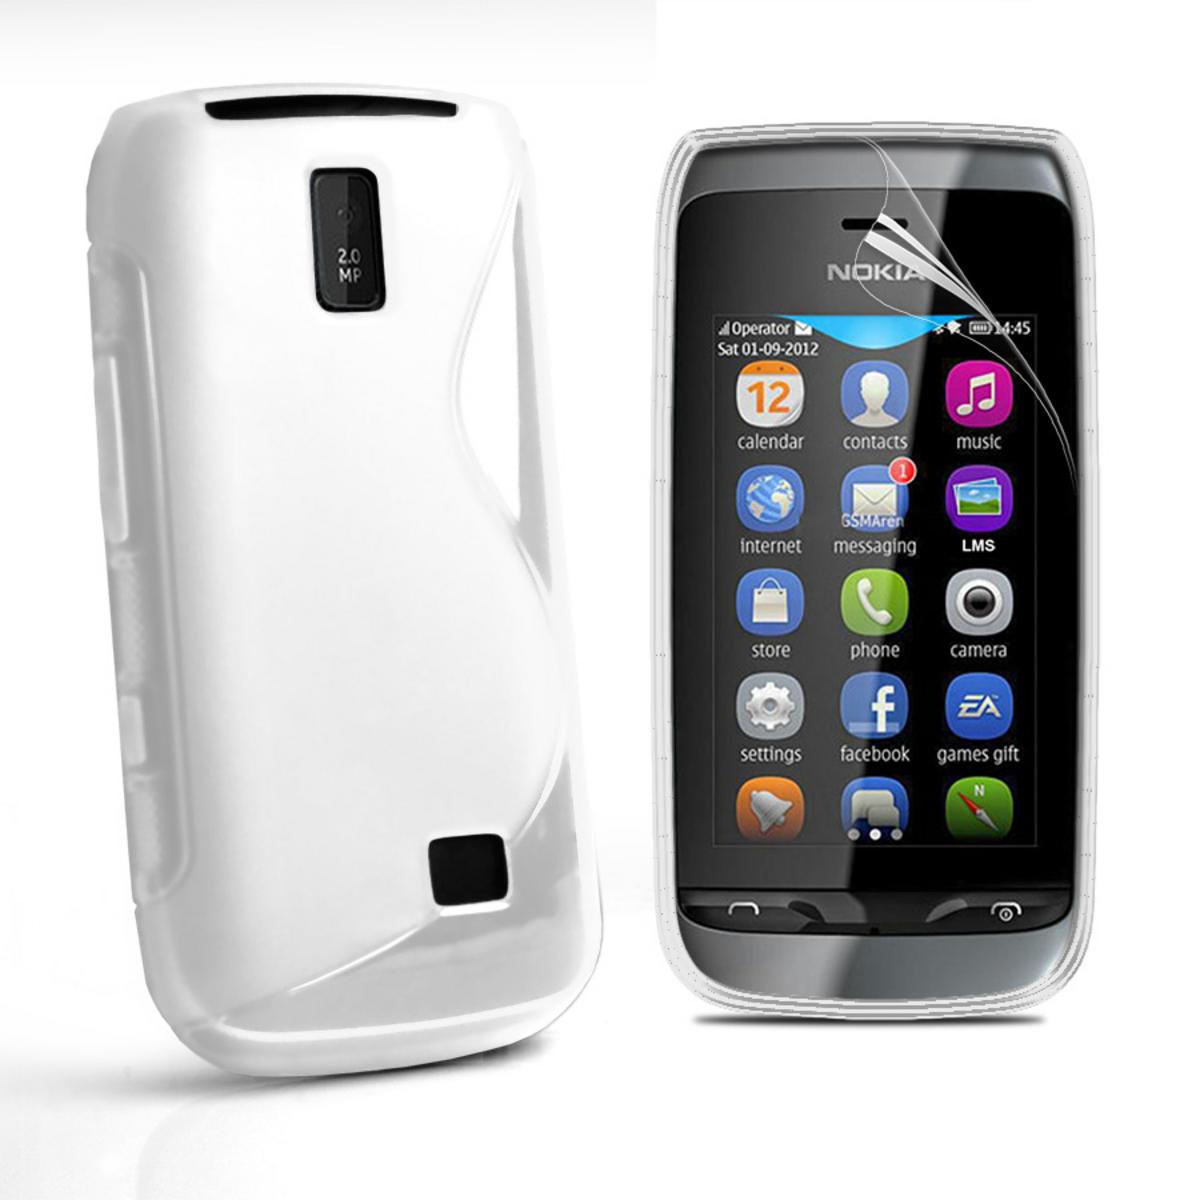 Download Aplikasi Facebook Hp Nokia X2 Xiluscup